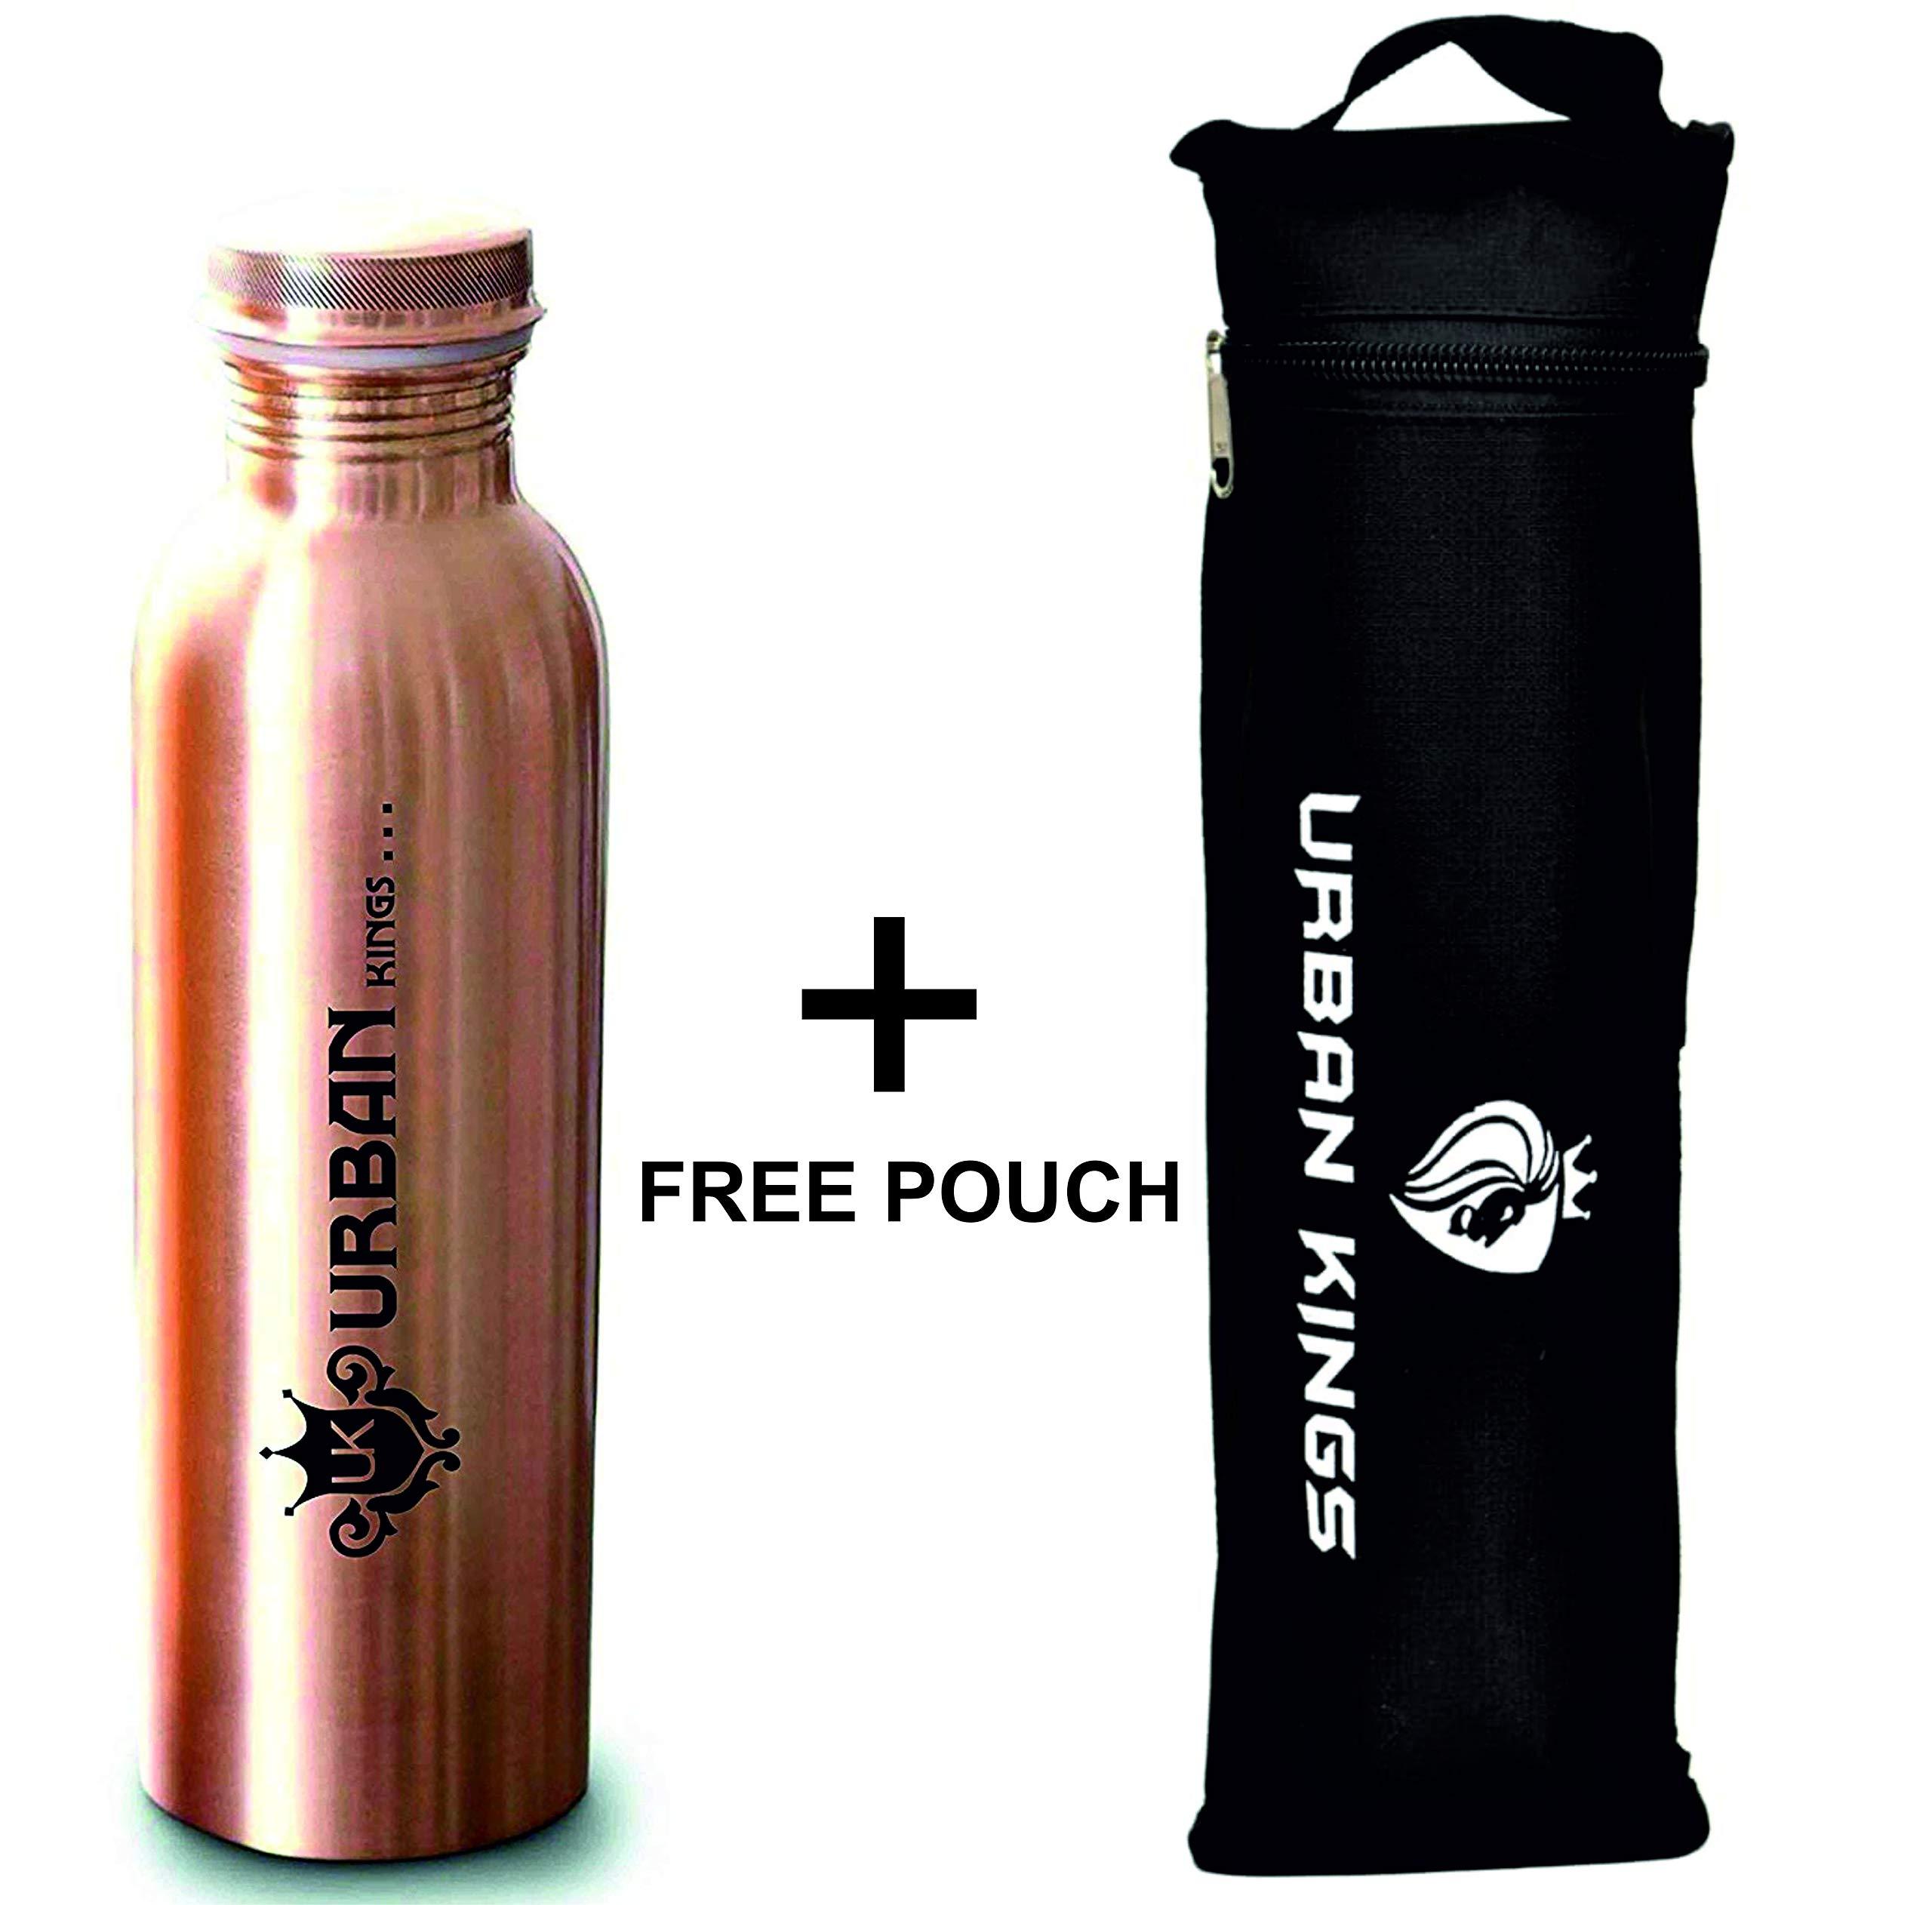 Pure Copper Water Bottle Ayurvedic Health Benefits Joint Free Leak Proof 1000ml